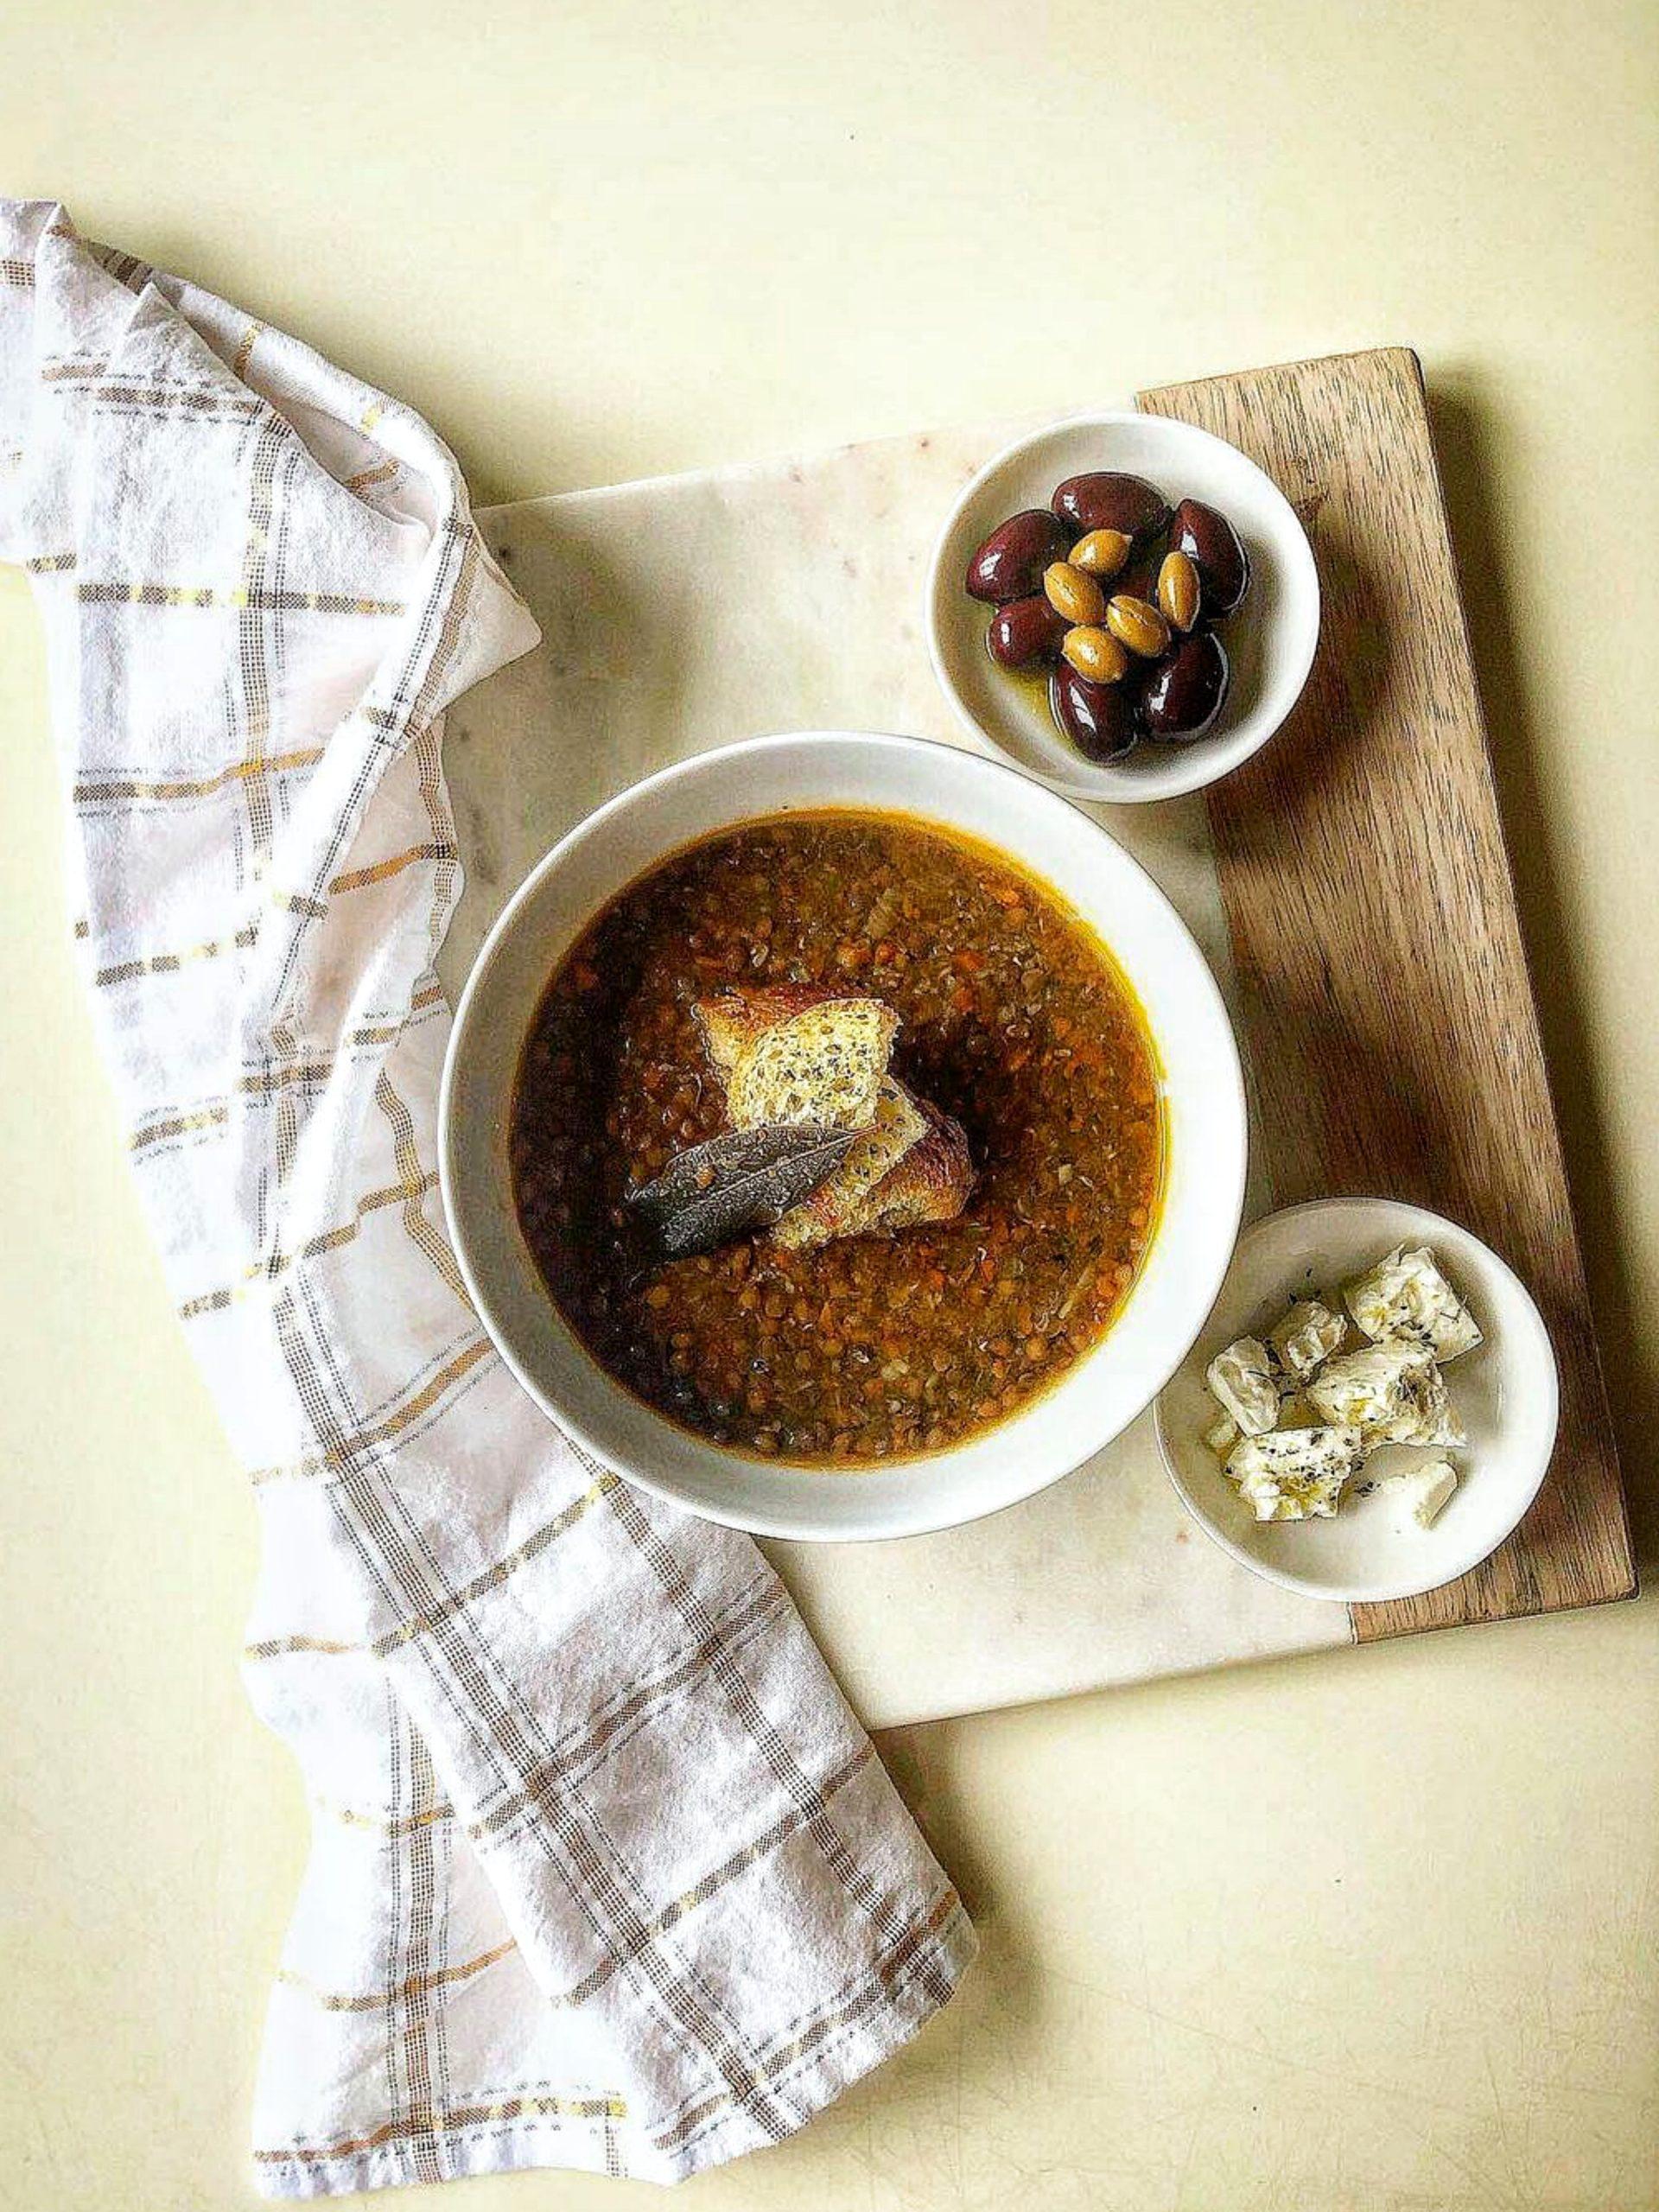 Food dish in bowls